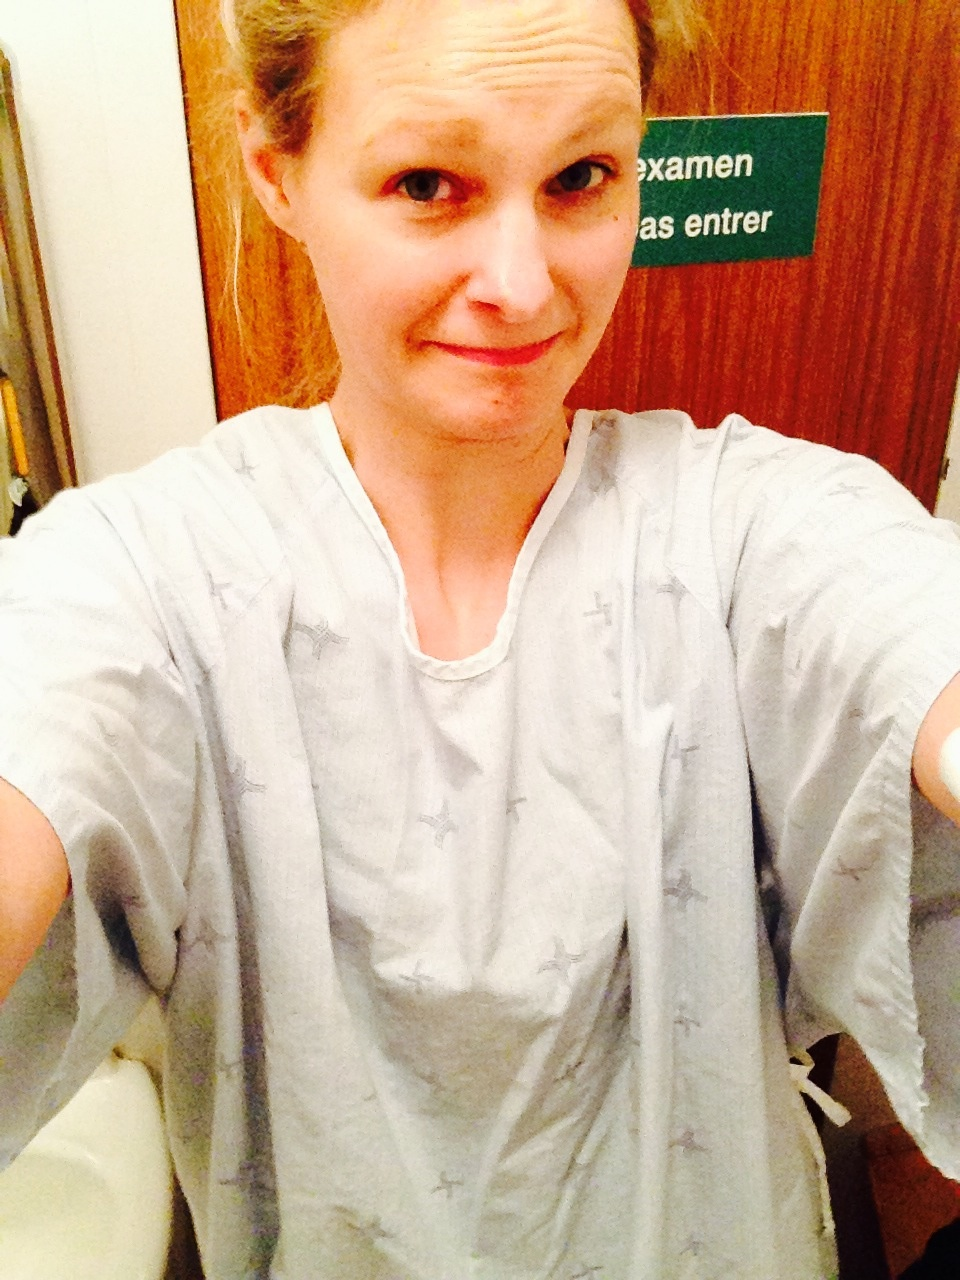 Beim ersten Ultraschall im Krankenhauskittel